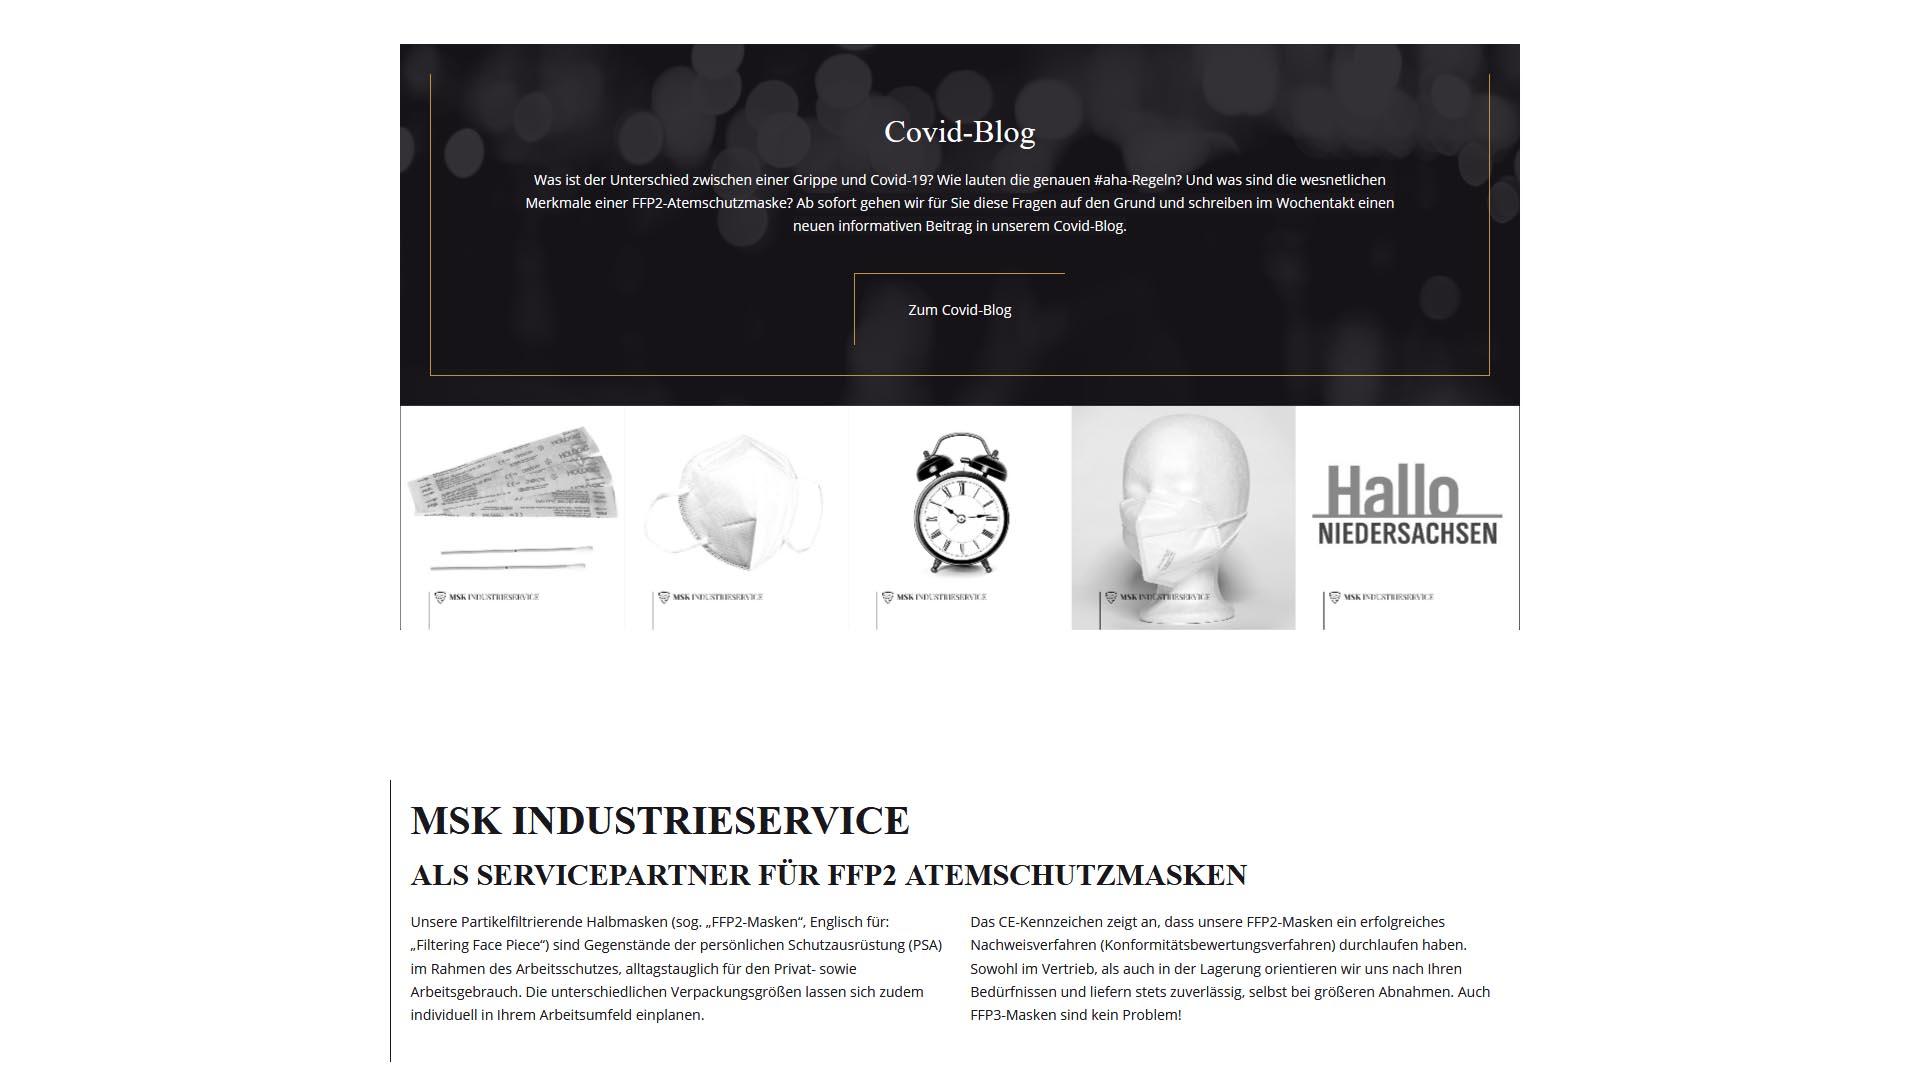 msk industrieservice atemschutzmasken ffp2 relaunch 4